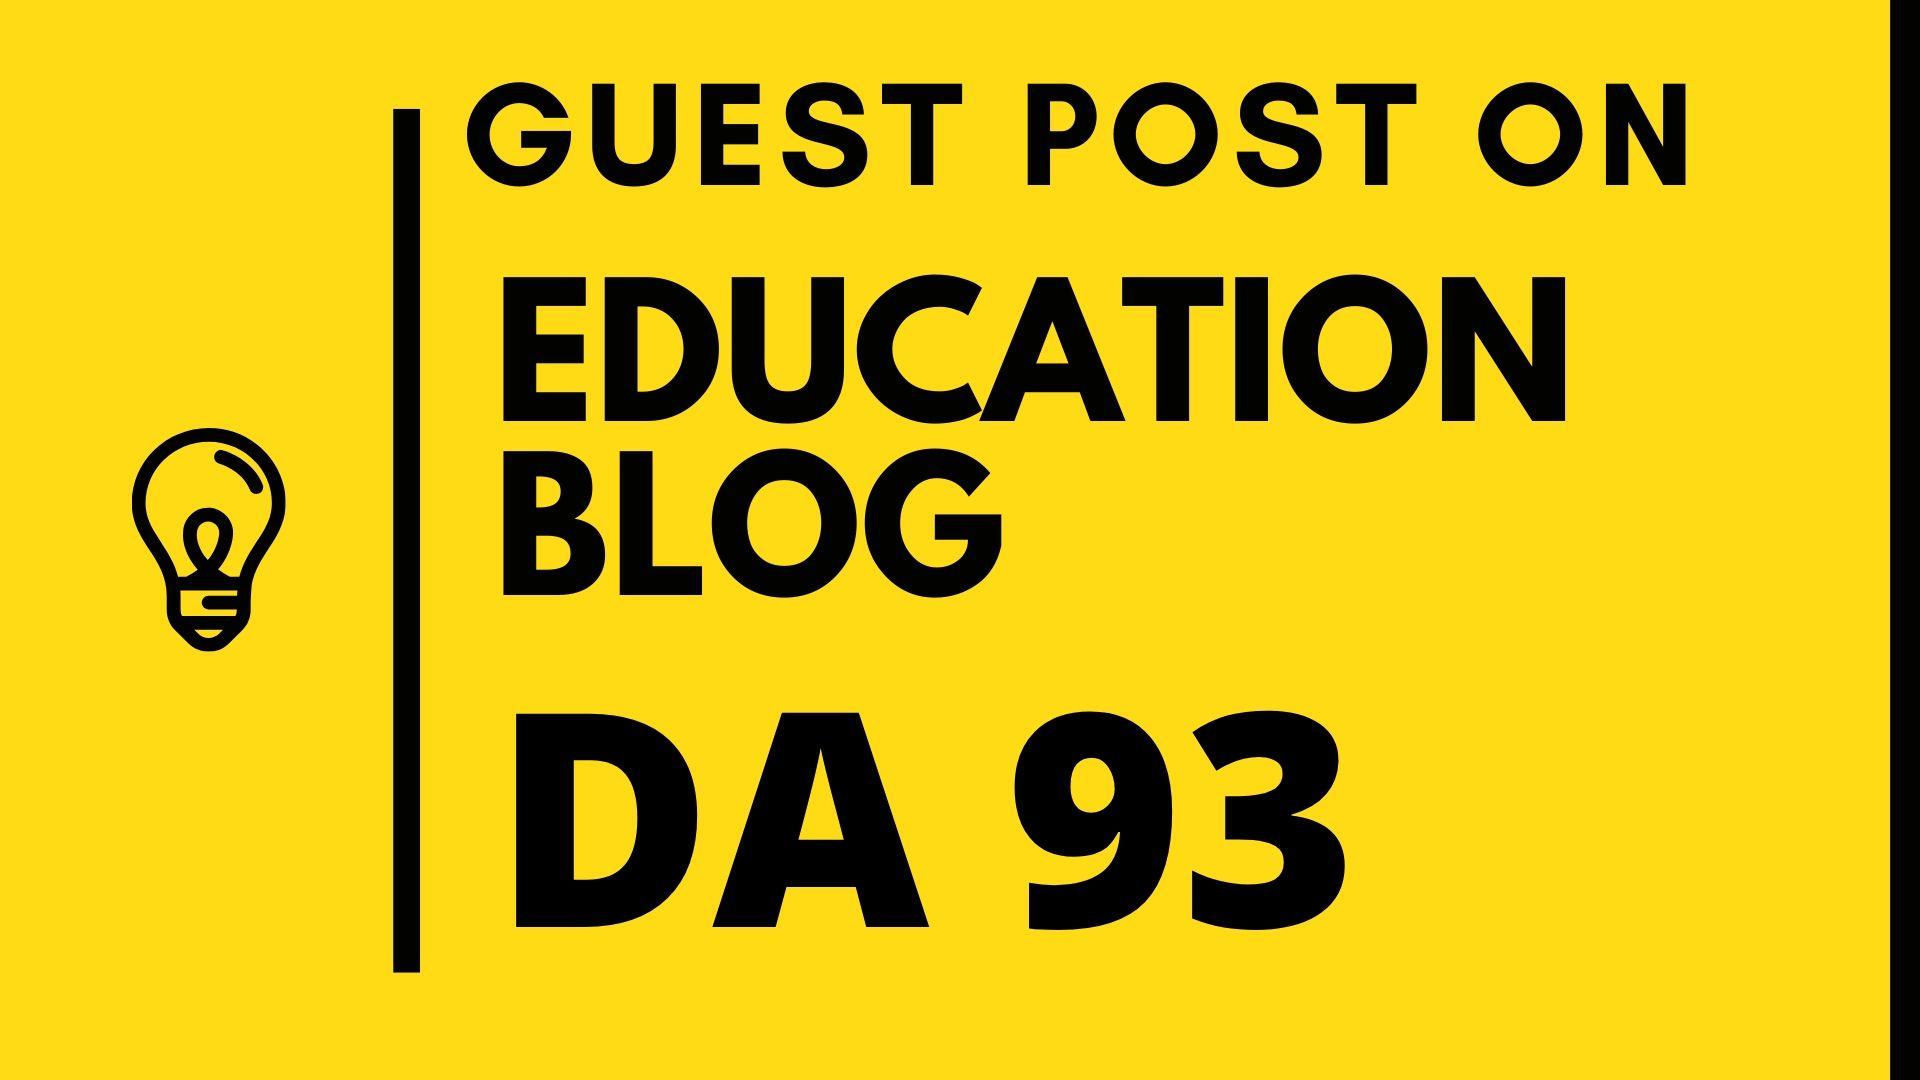 I will do SEO guest post on high authority education blog da 93